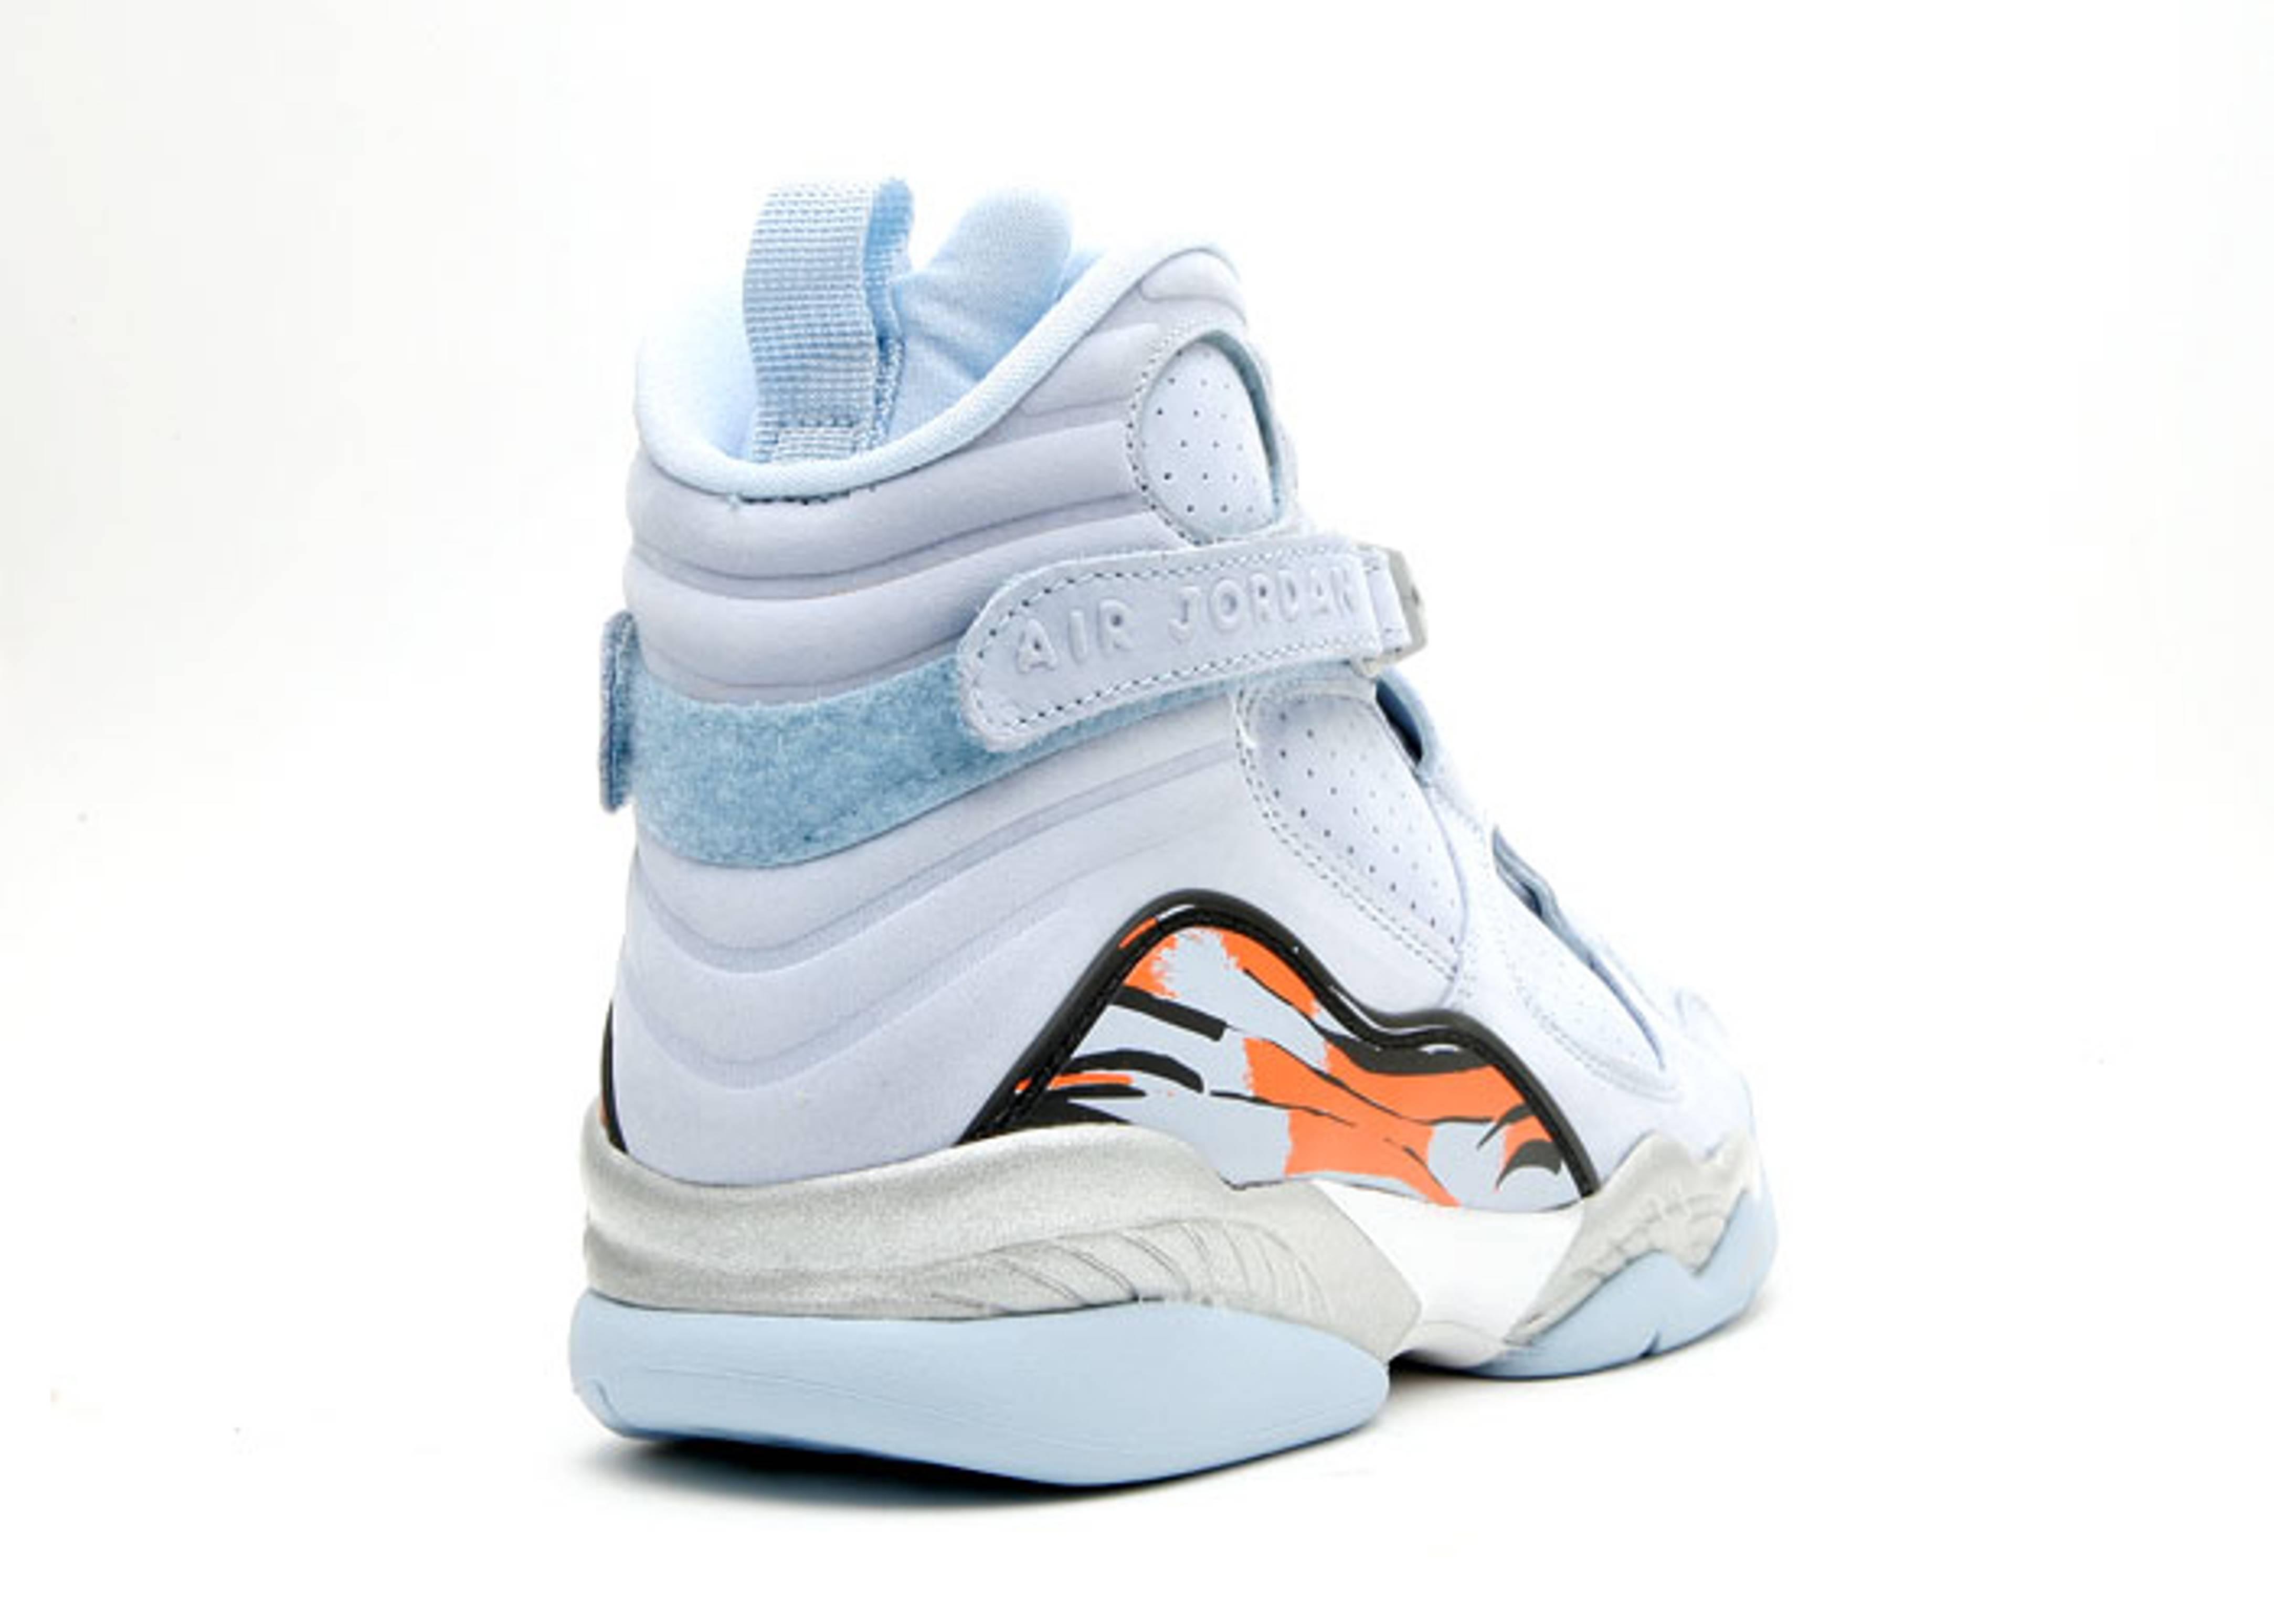 online store 1ed9c a4bf3 W s Air Jordan 8 Retro